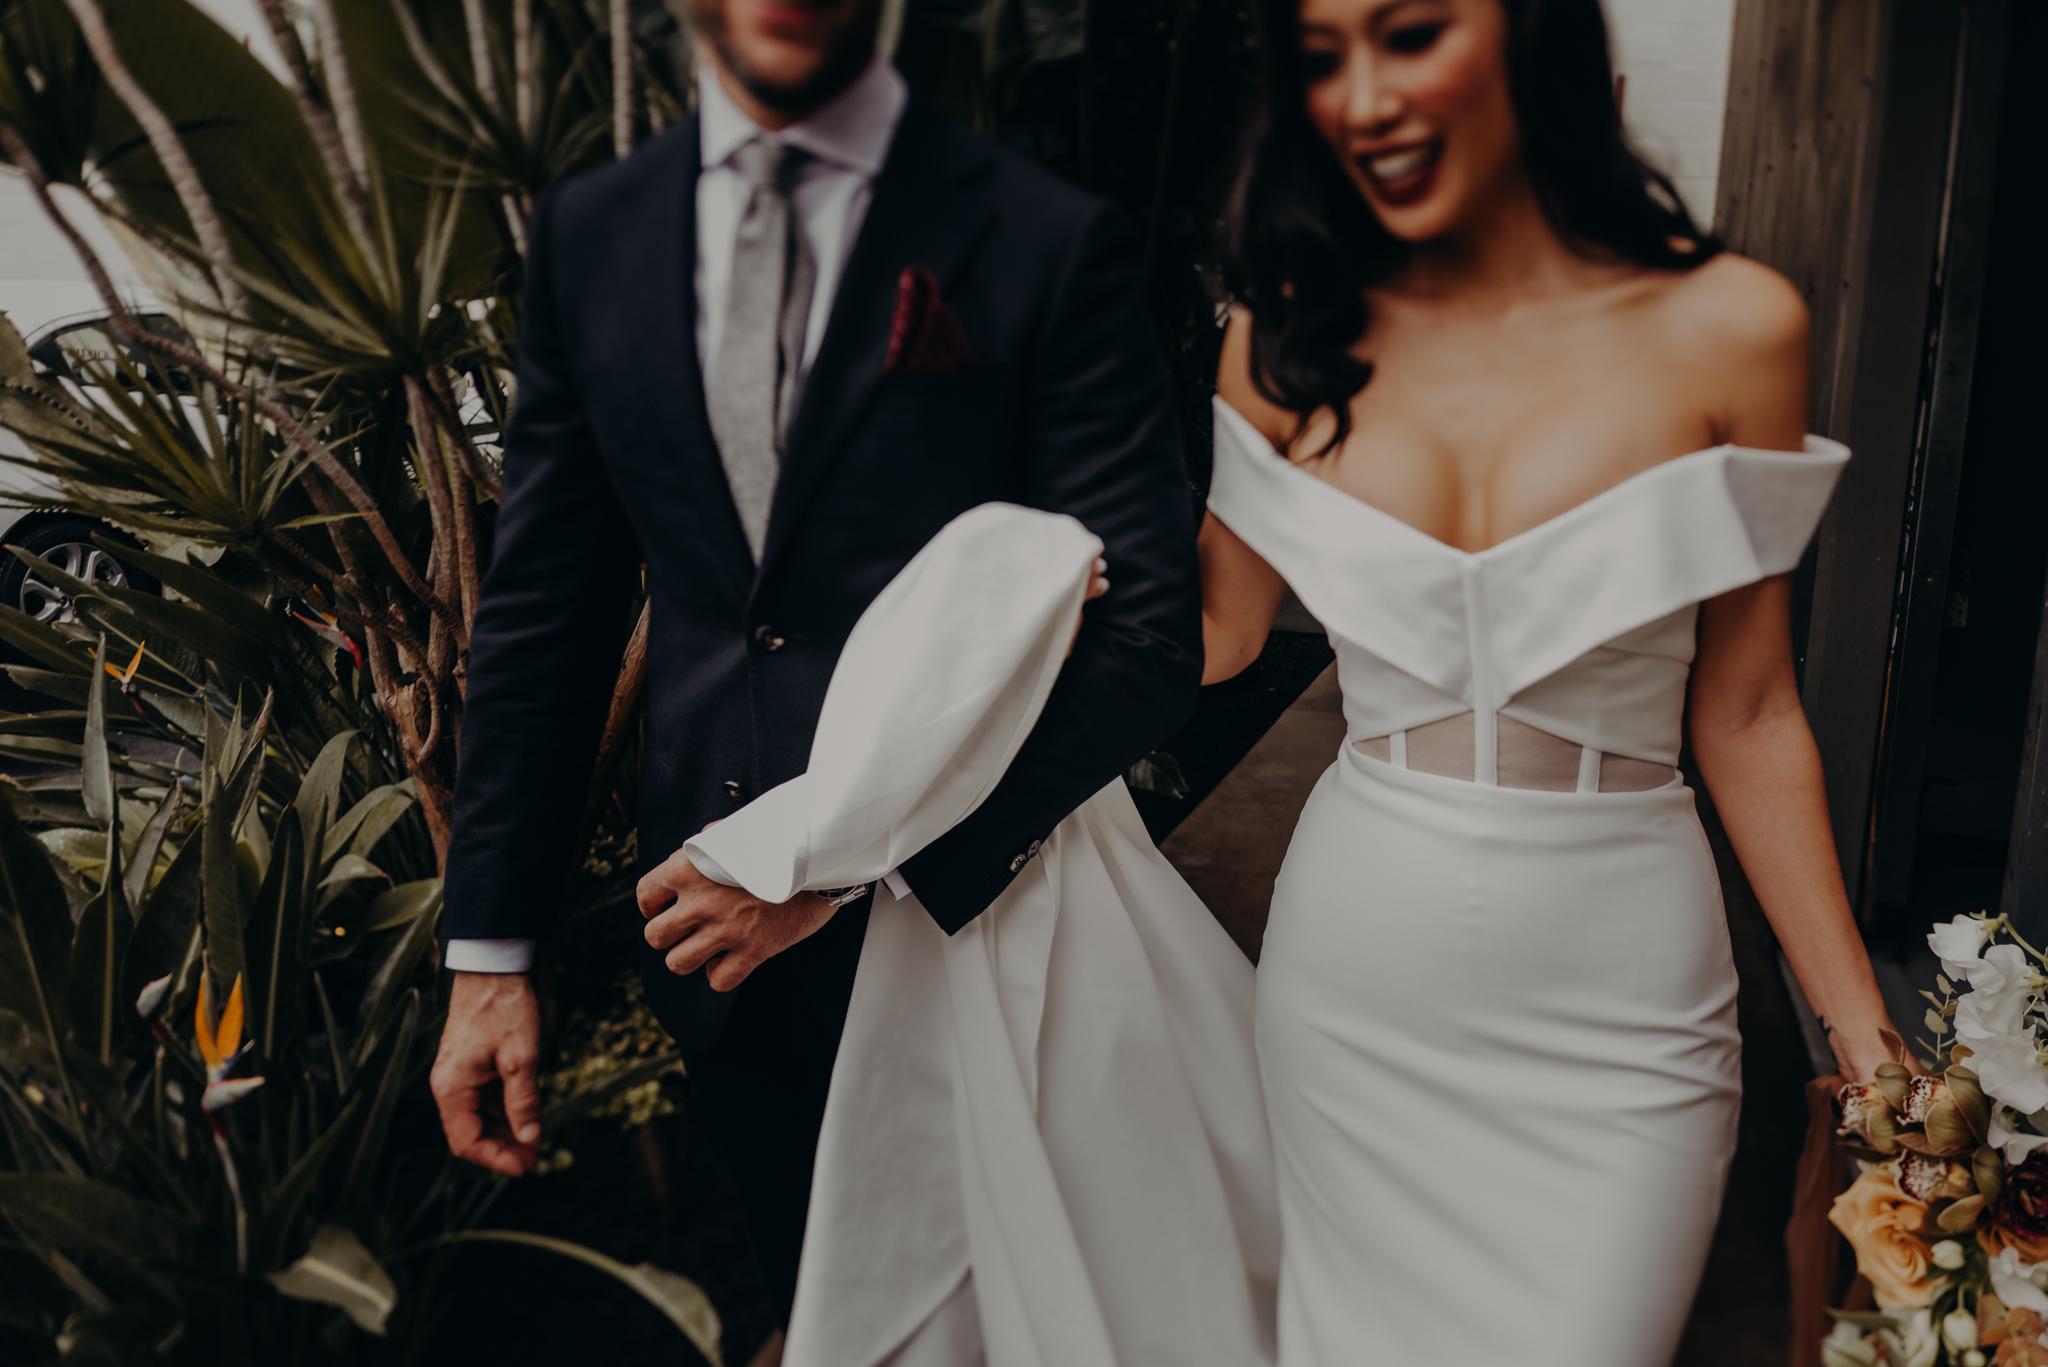 Wedding Photo LA - wedding photographer in los angeles - millwick wedding venue -isaiahandtaylor.com-063.jpg